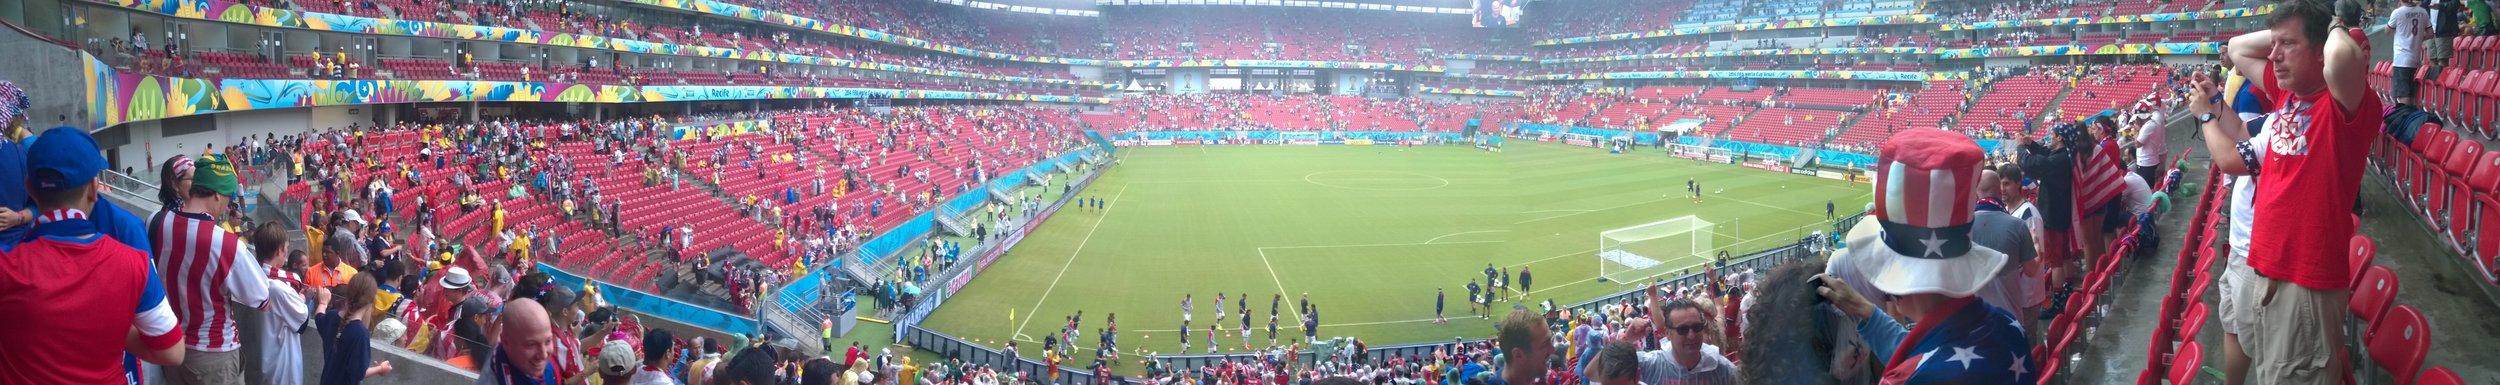 Arena Pernambuco in all of its glory